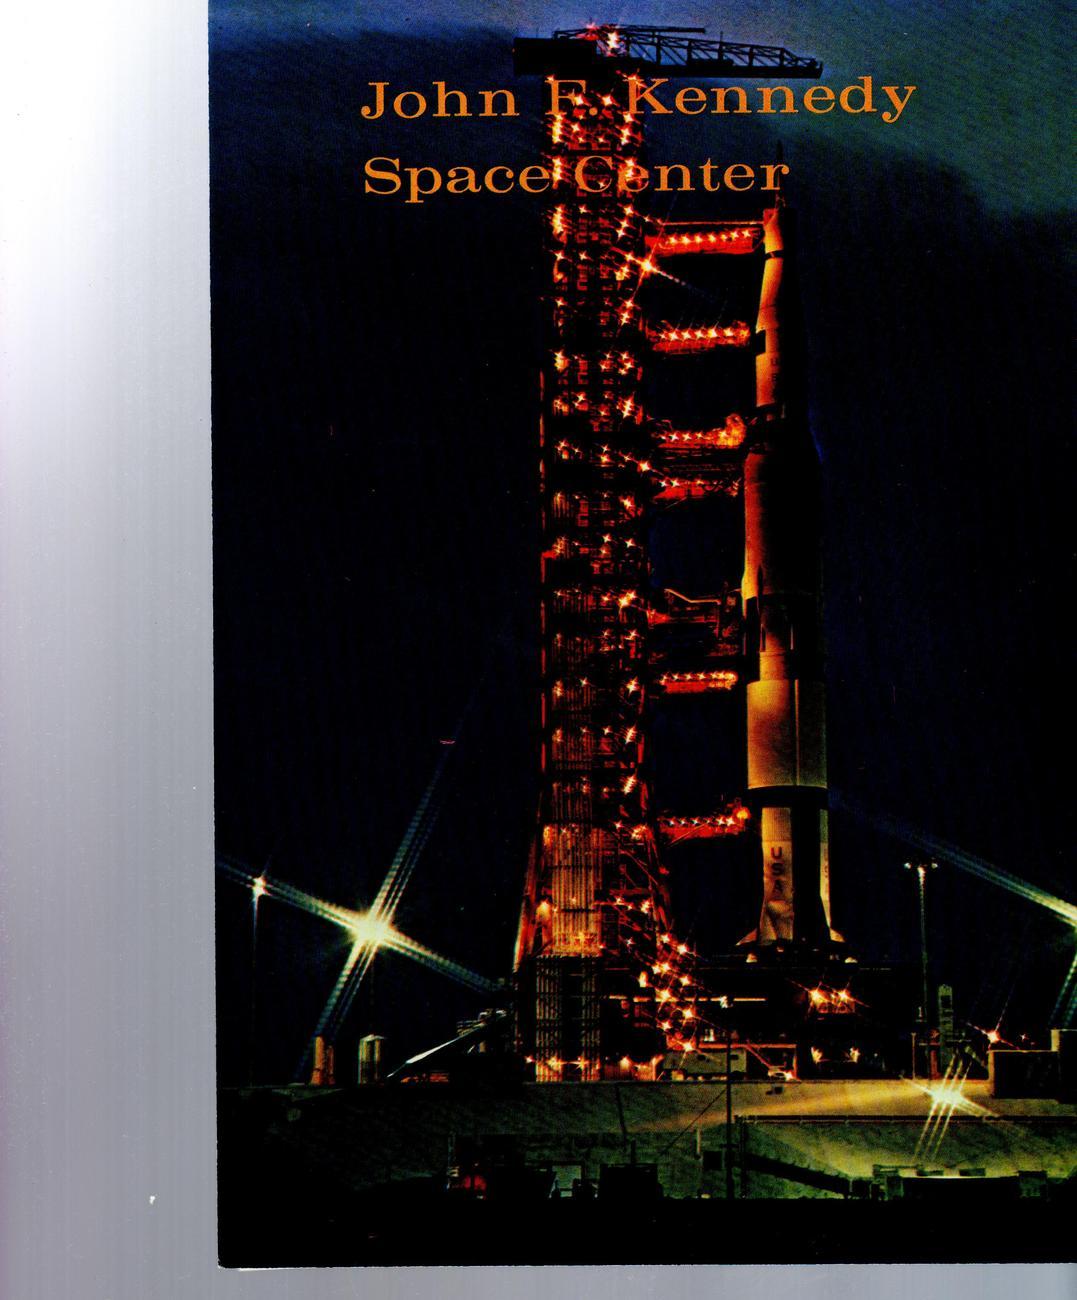 NASA - John F. Kennedy Space Center